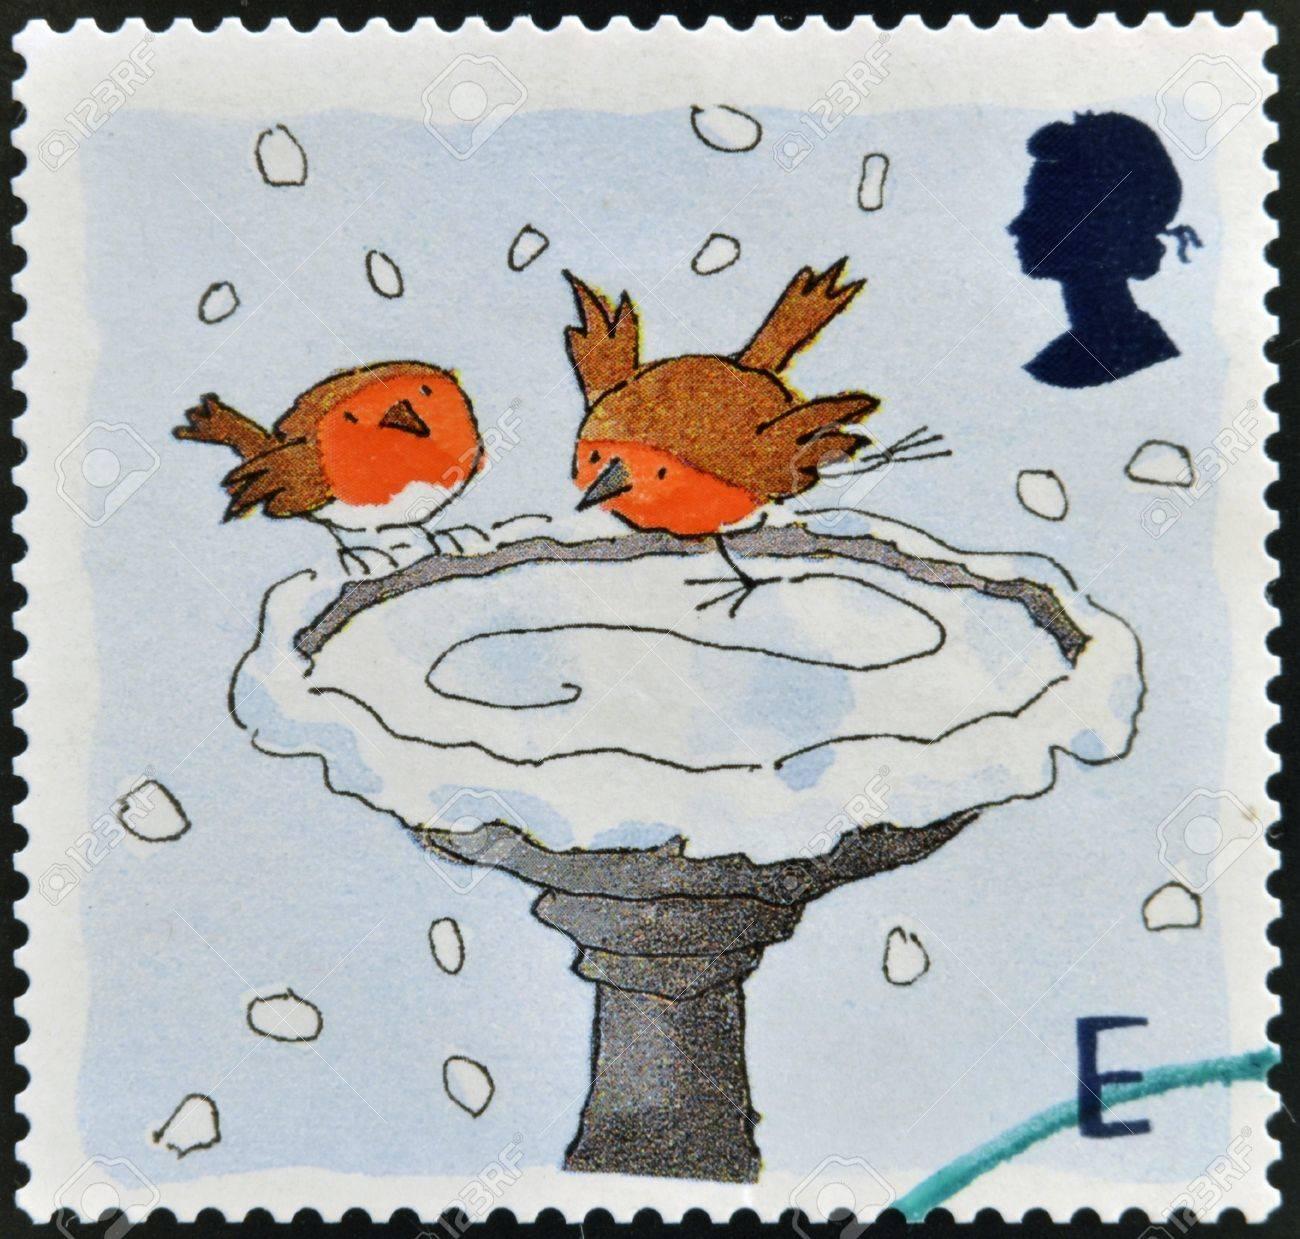 UNITED KINGDOM - CIRCA 2001: A stamp printed in England, is dedicated to Christmas, shows Robins skating on Bird Bath, circa 2001 Stock Photo - 16306859